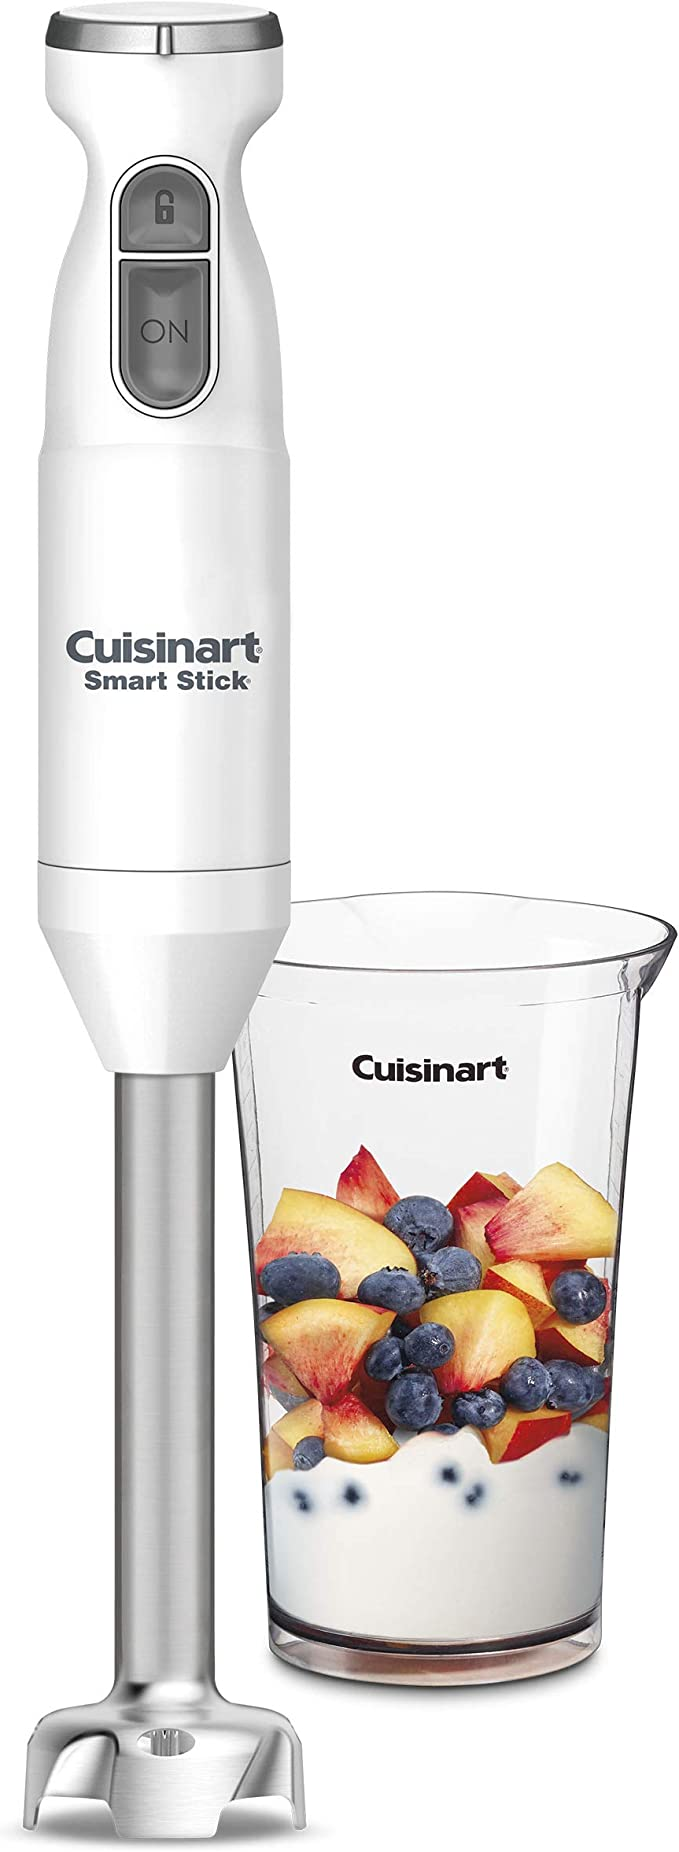 White NEW Cuisinart 2-Speed Smart Stick Hand Blender Mixer CSB-175